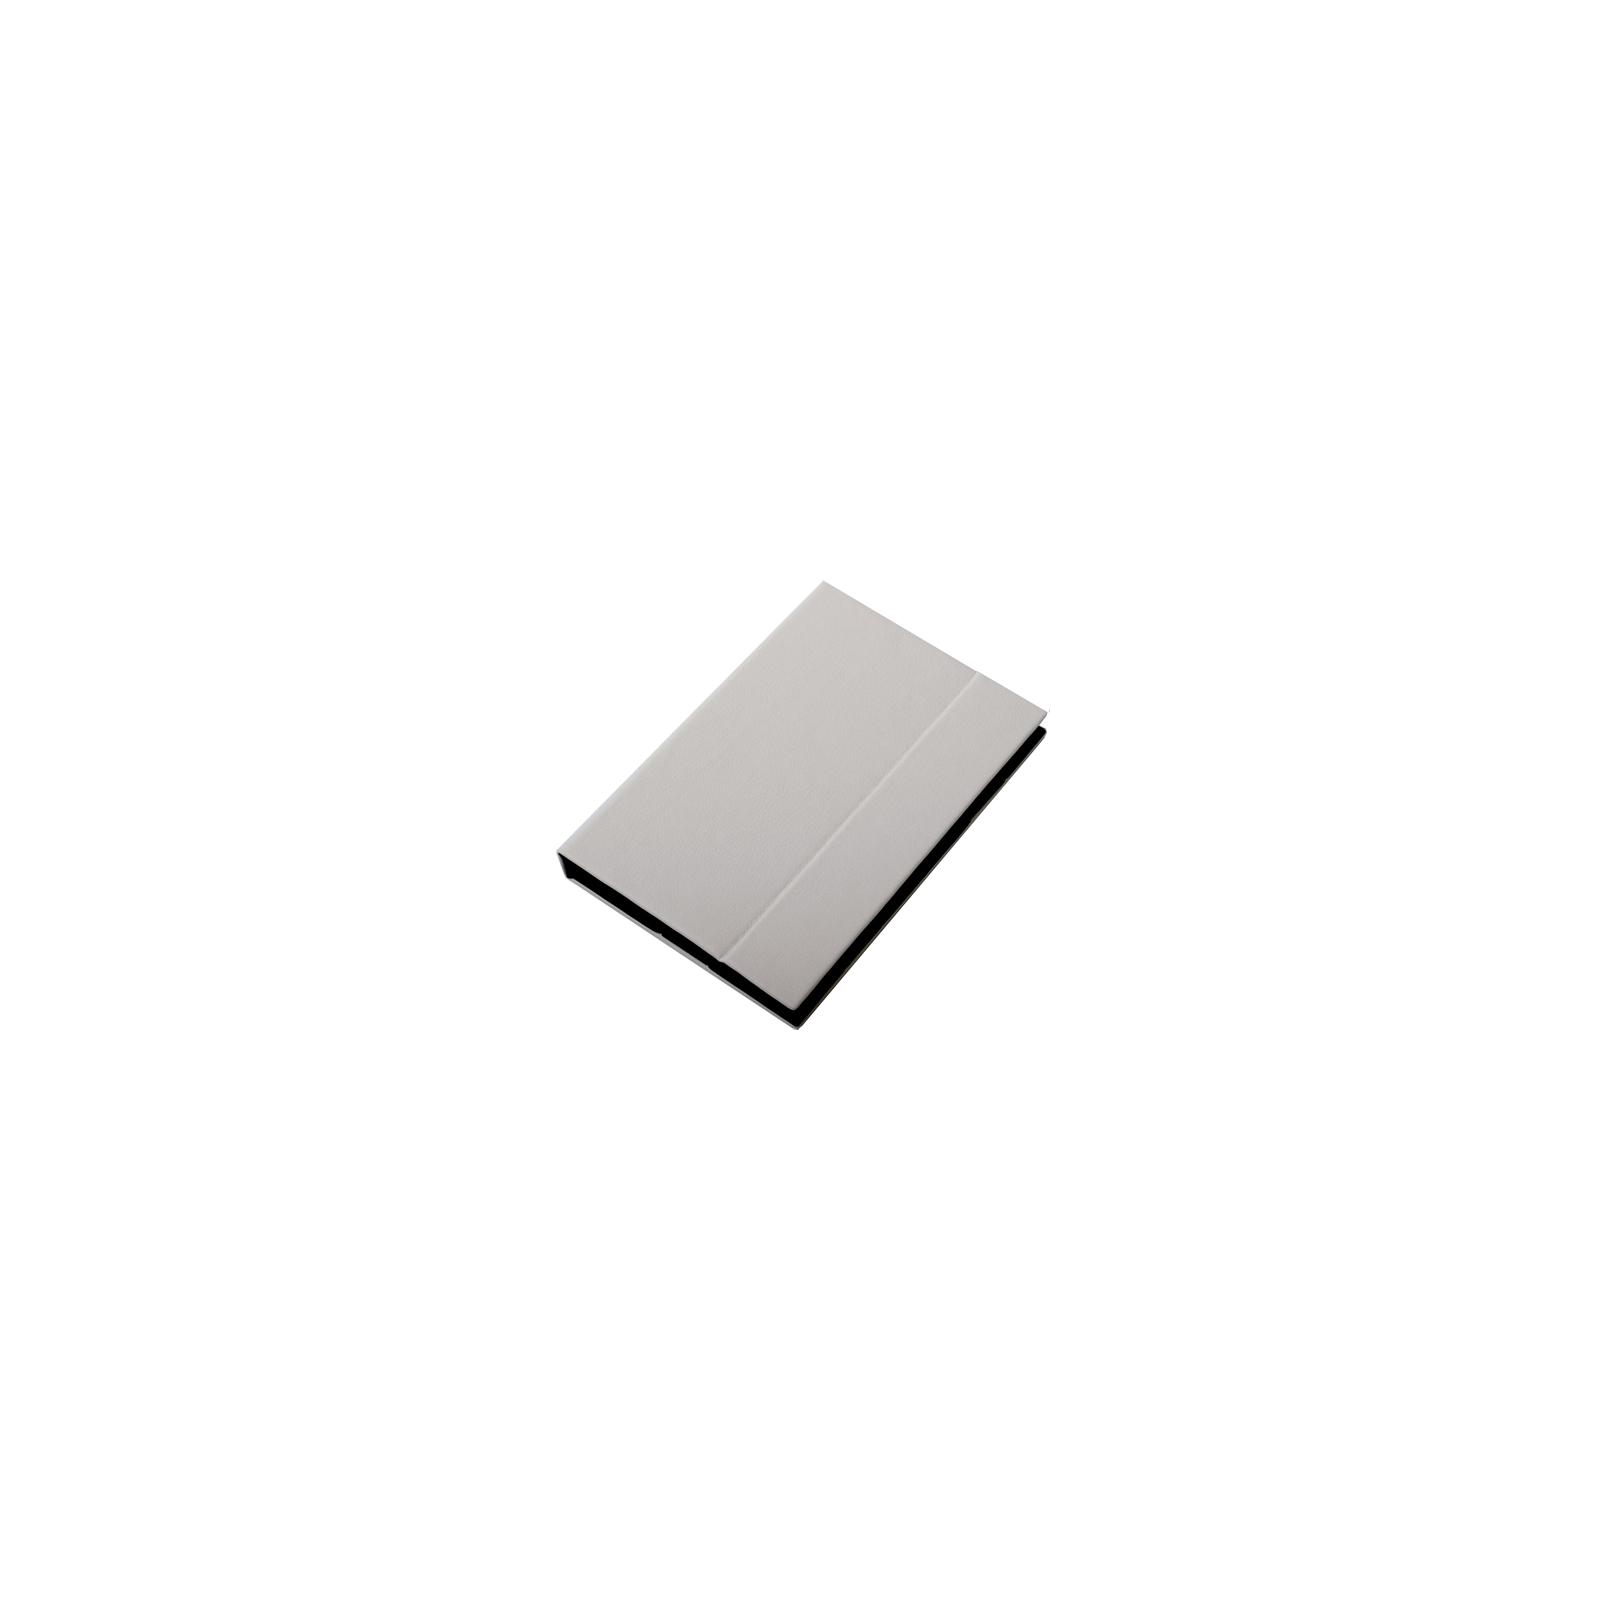 Чехол для планшета Vento 9 Desire Matt - white